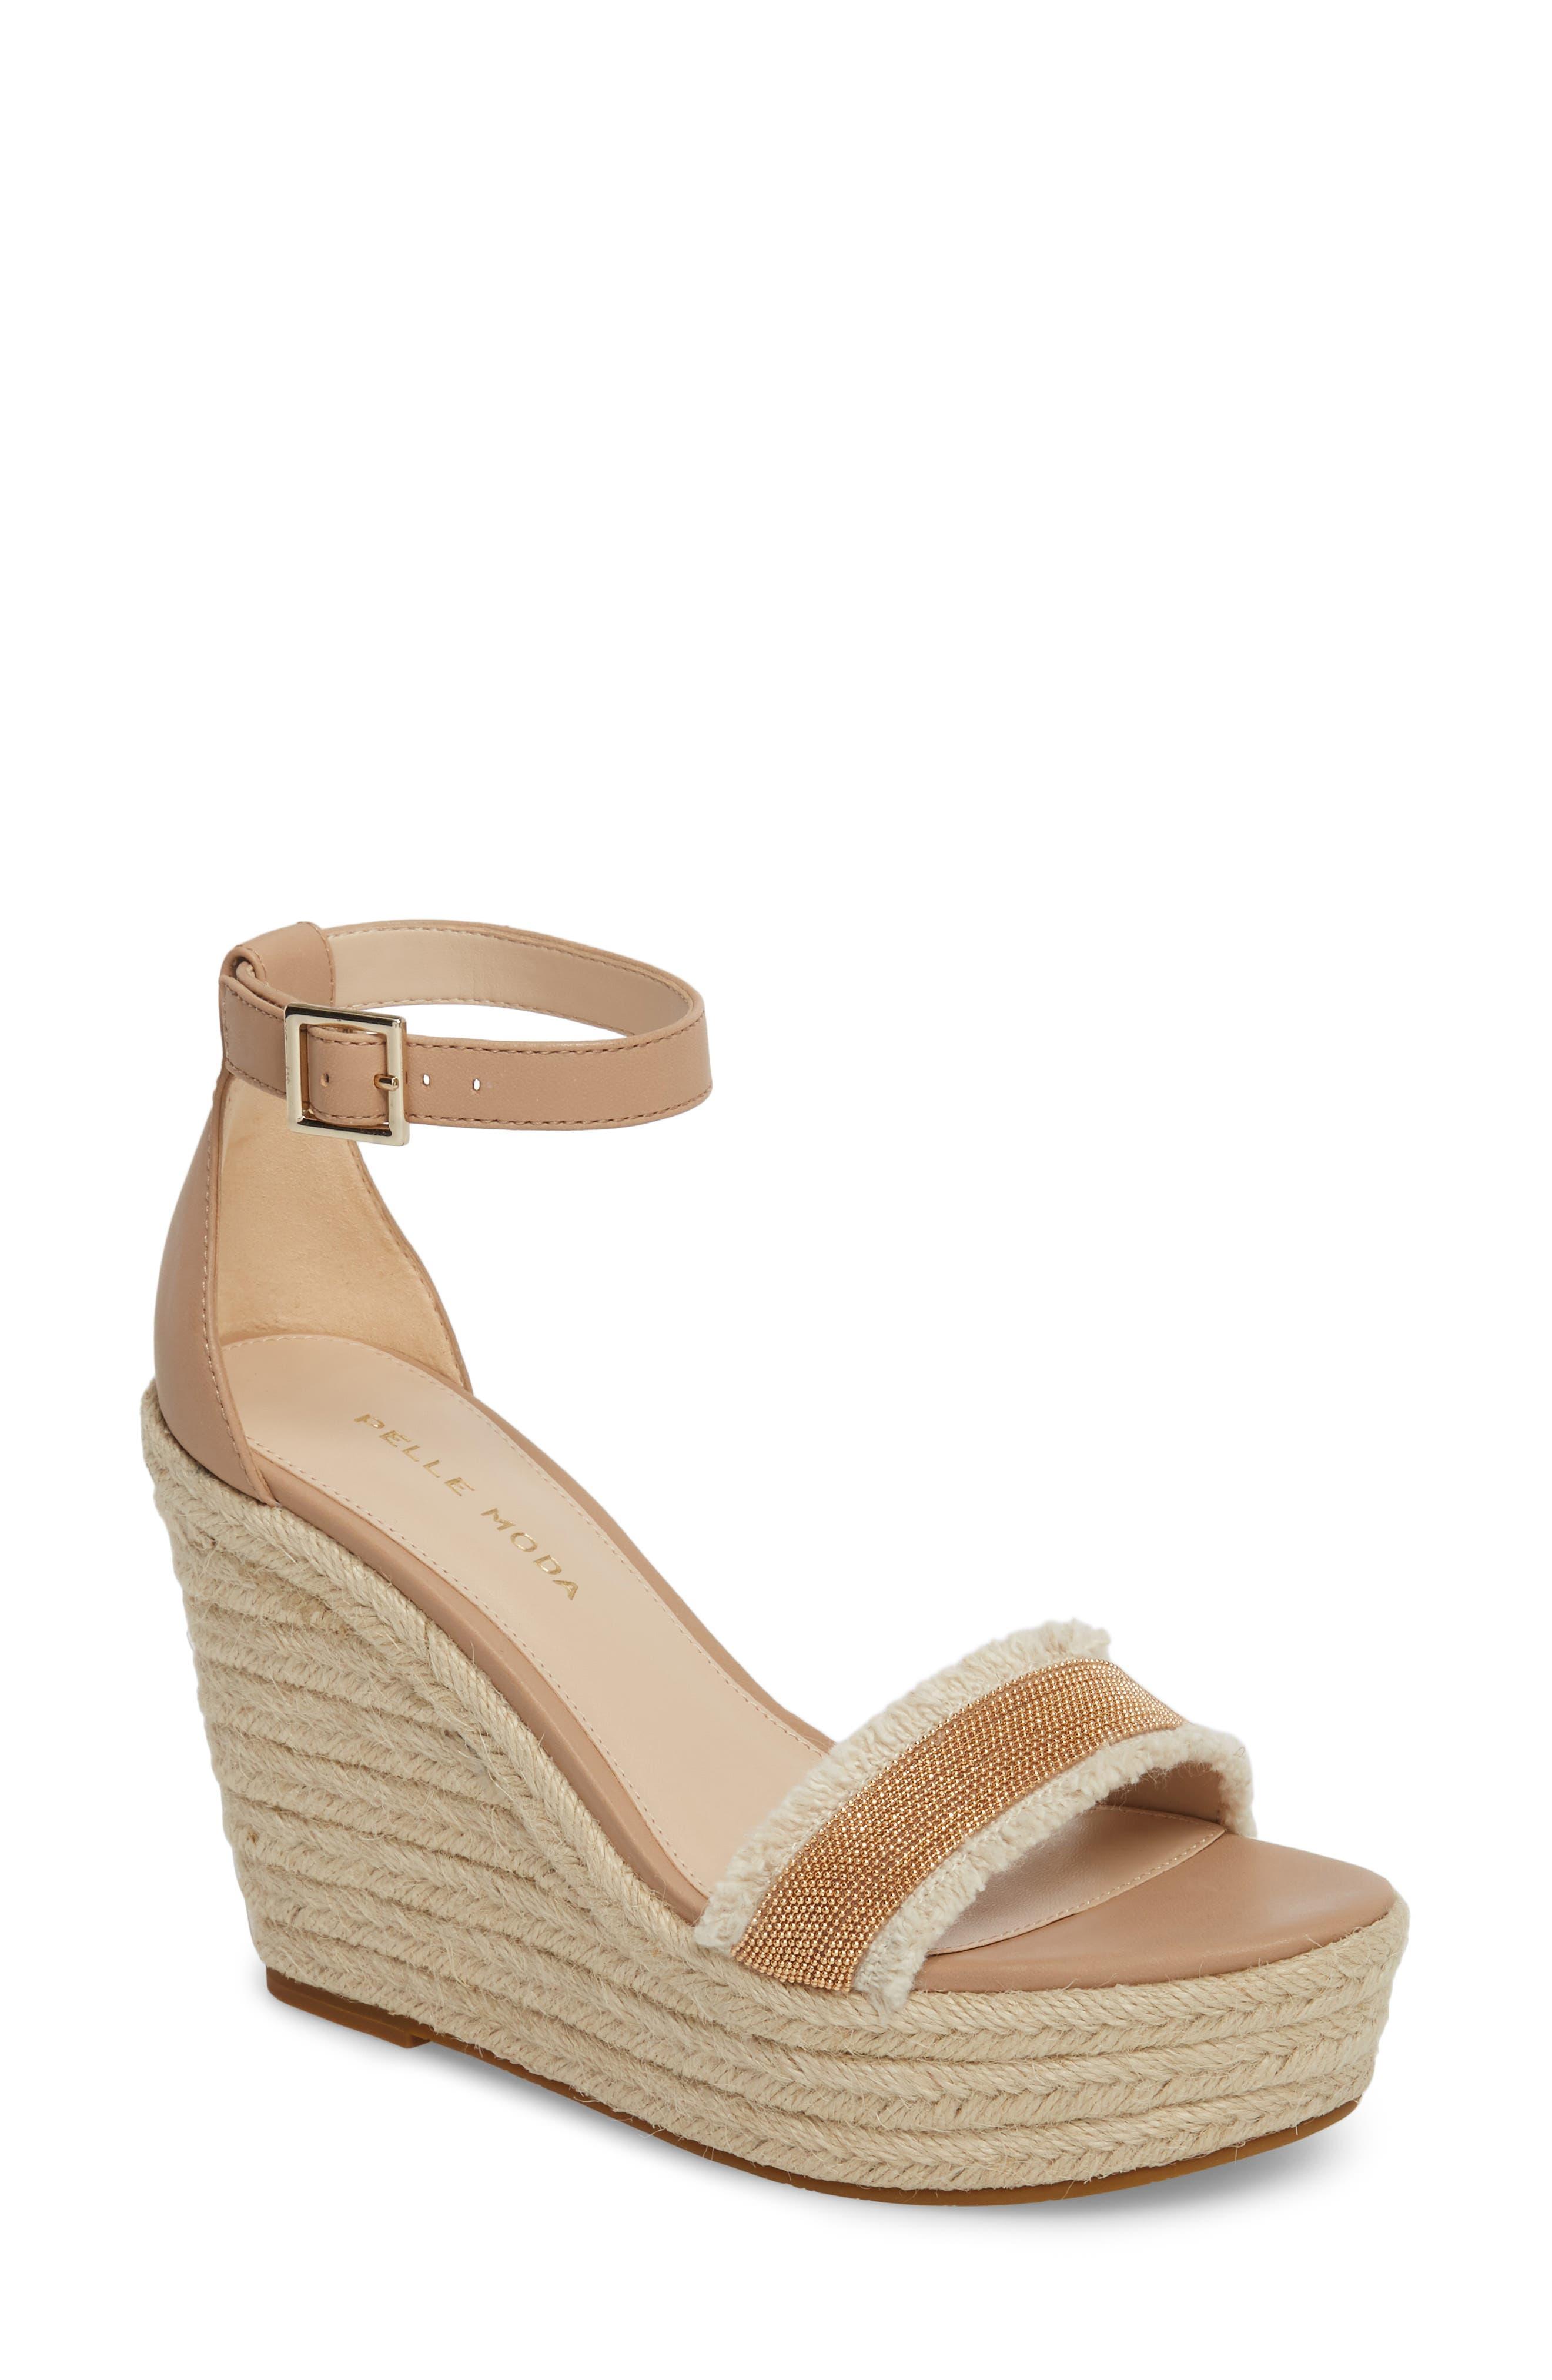 Radley Espadrille Wedge Sandal,                         Main,                         color, Sand Leather